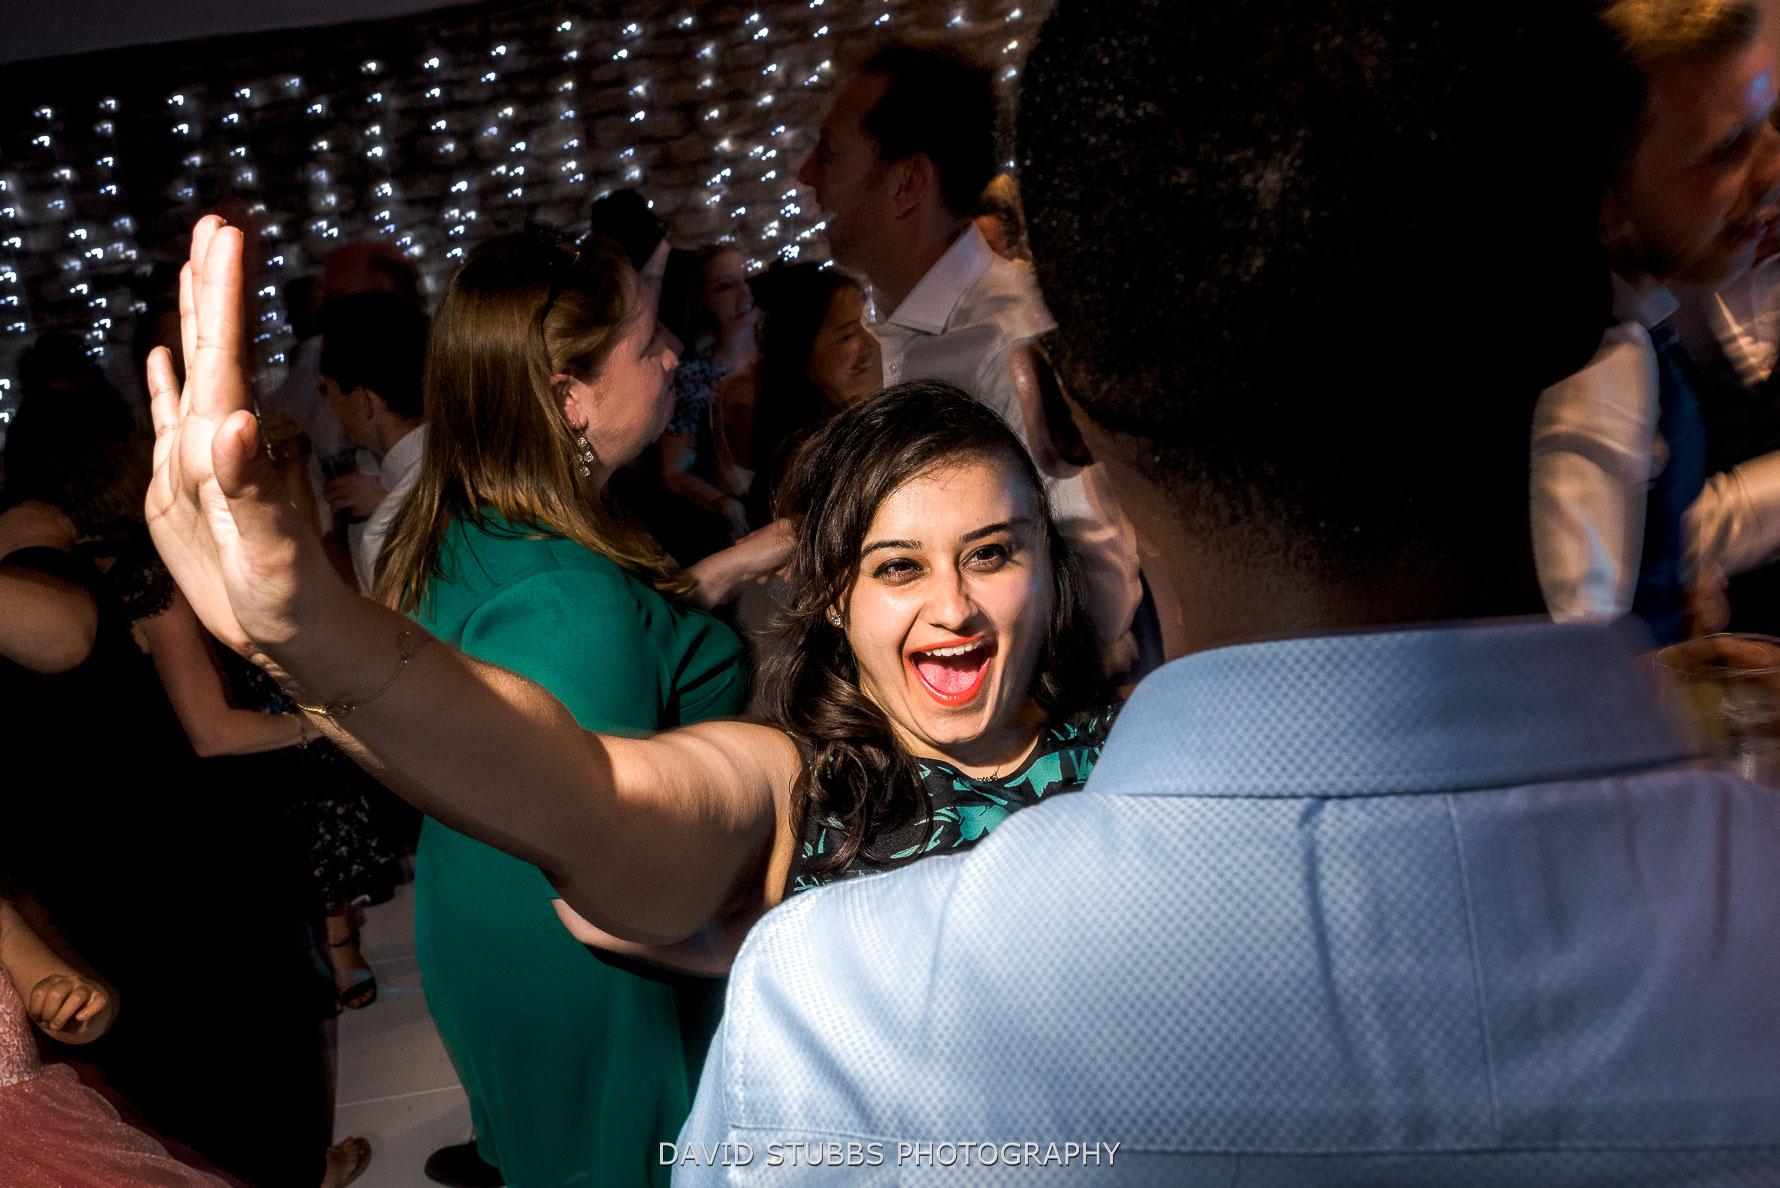 dancing and fun